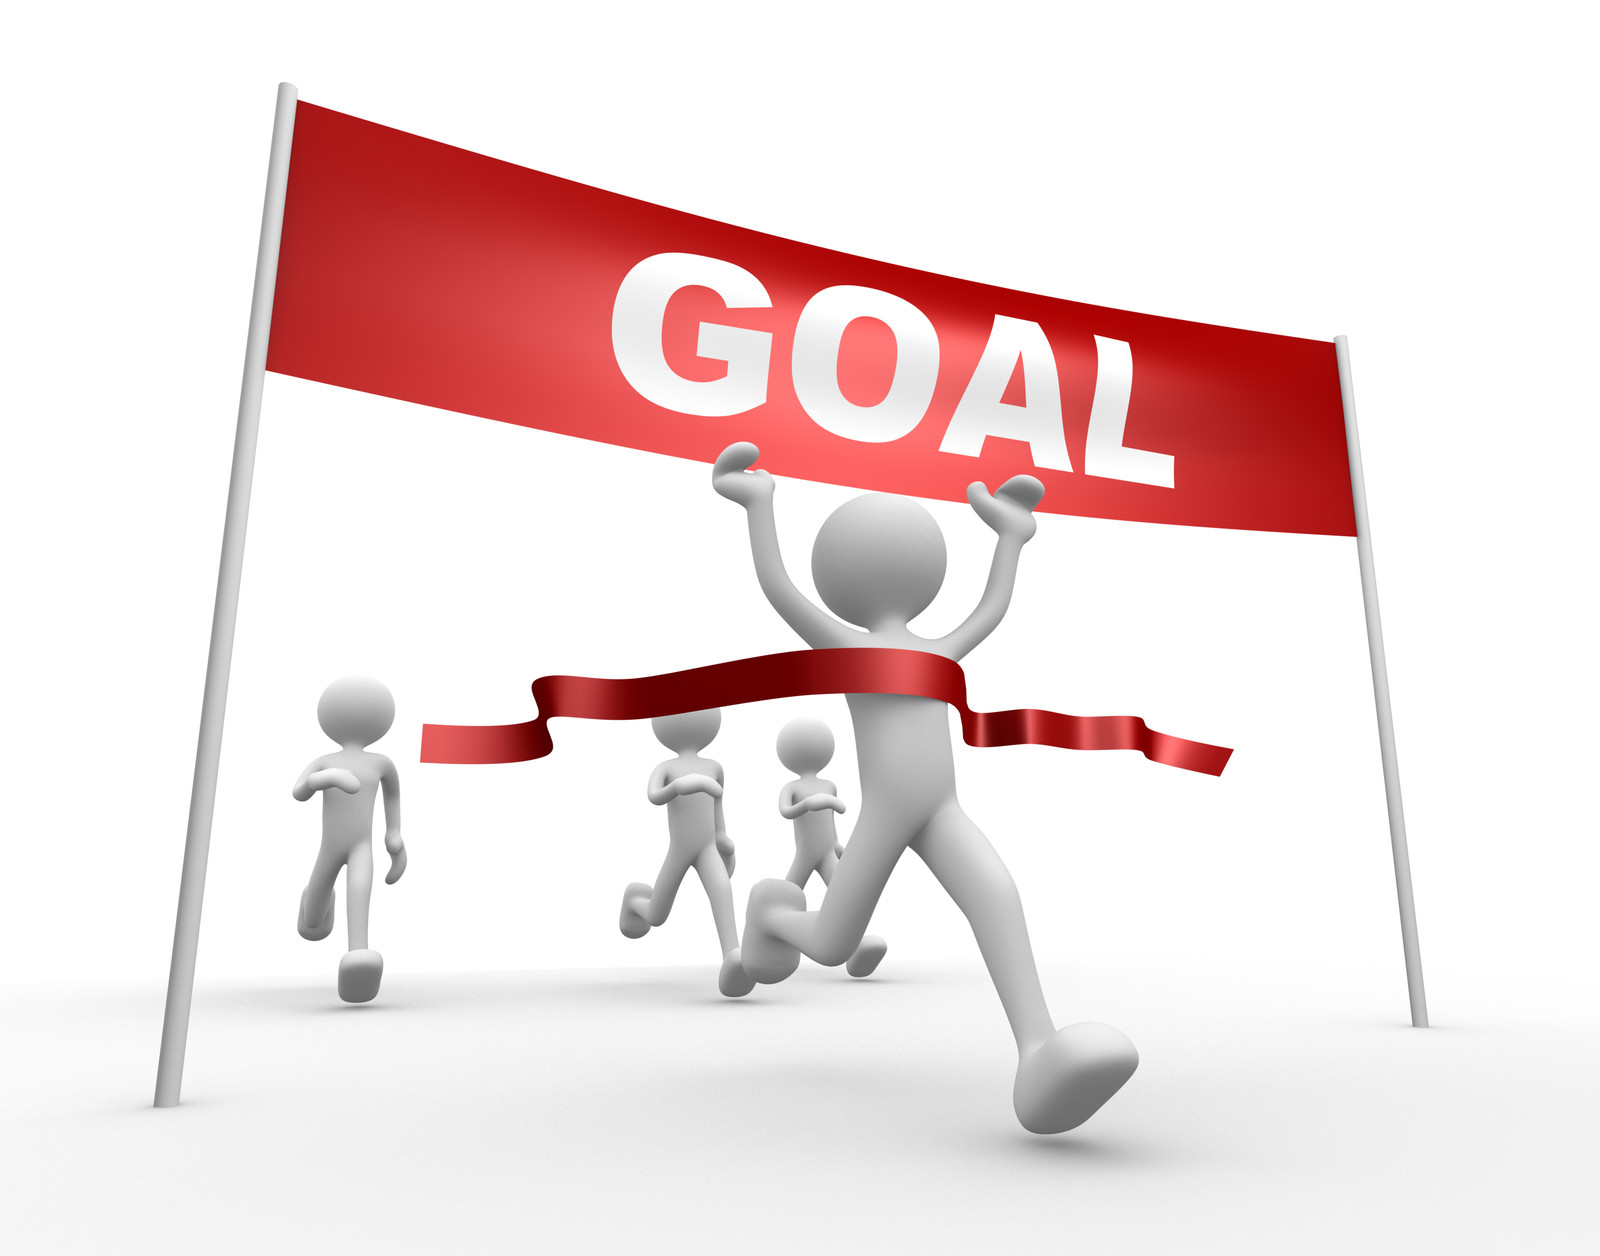 Goal Clipart - Clipart Kid